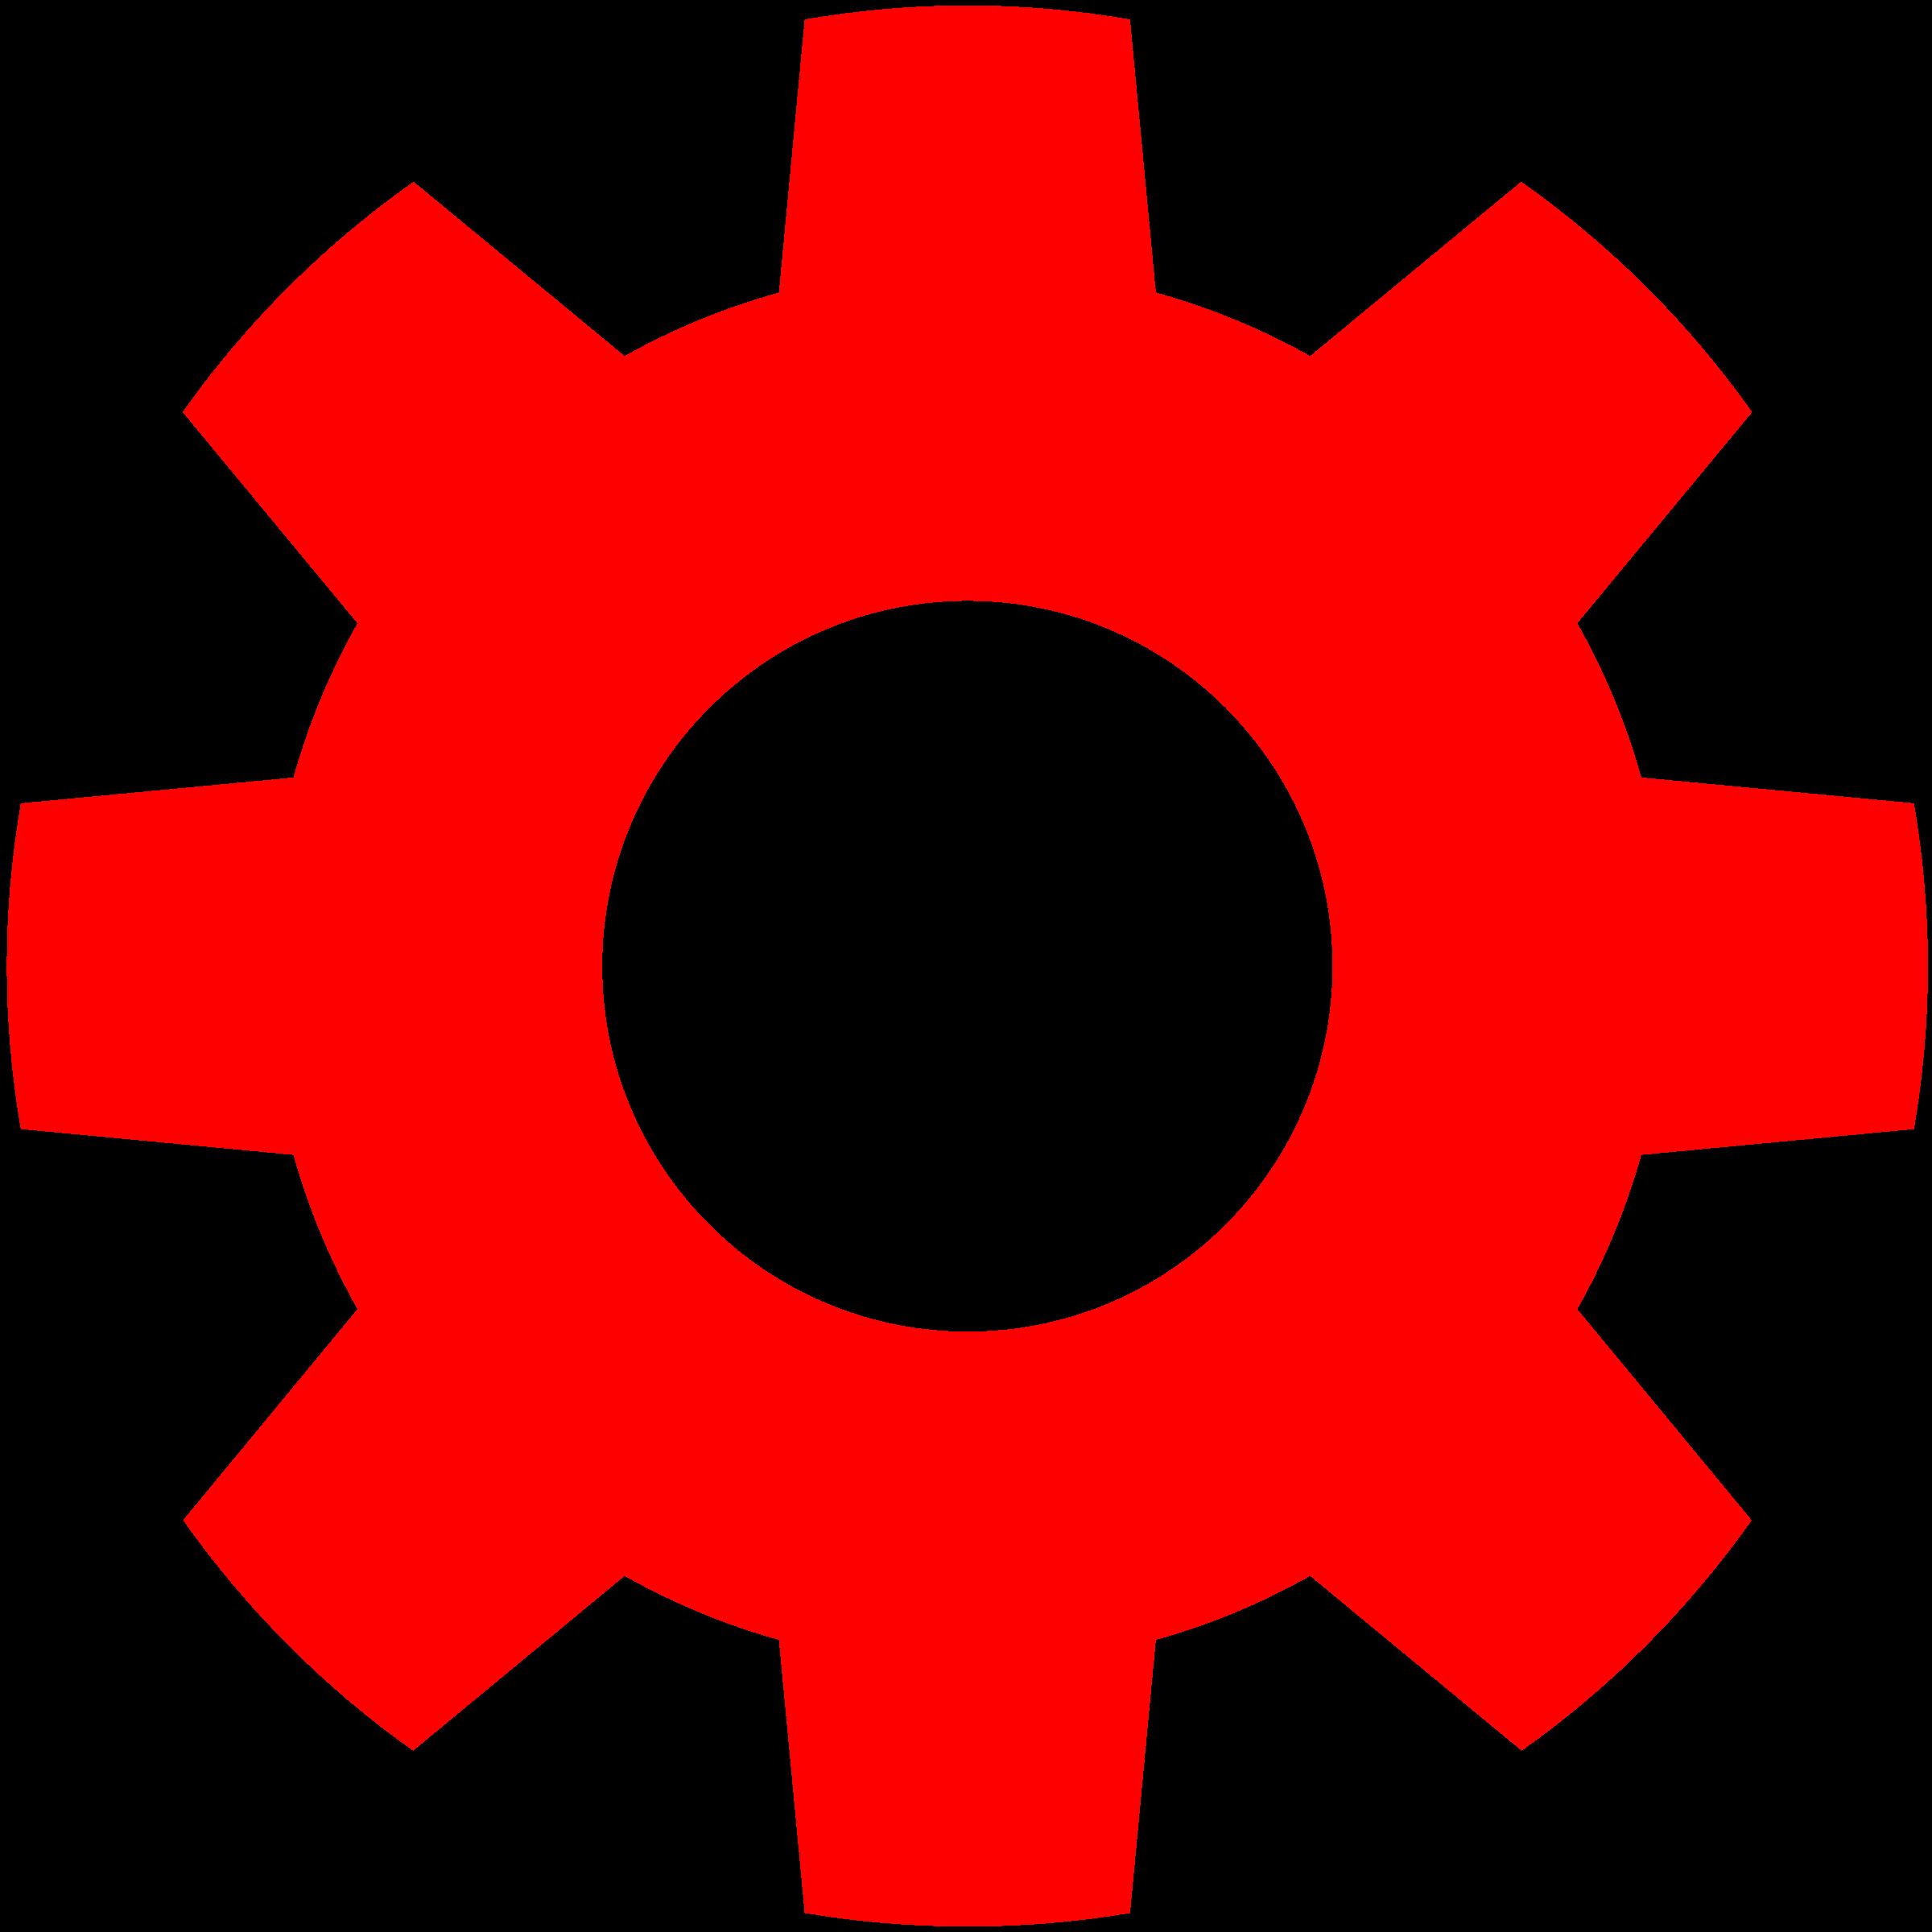 Gears clipart grey. Gear in red big